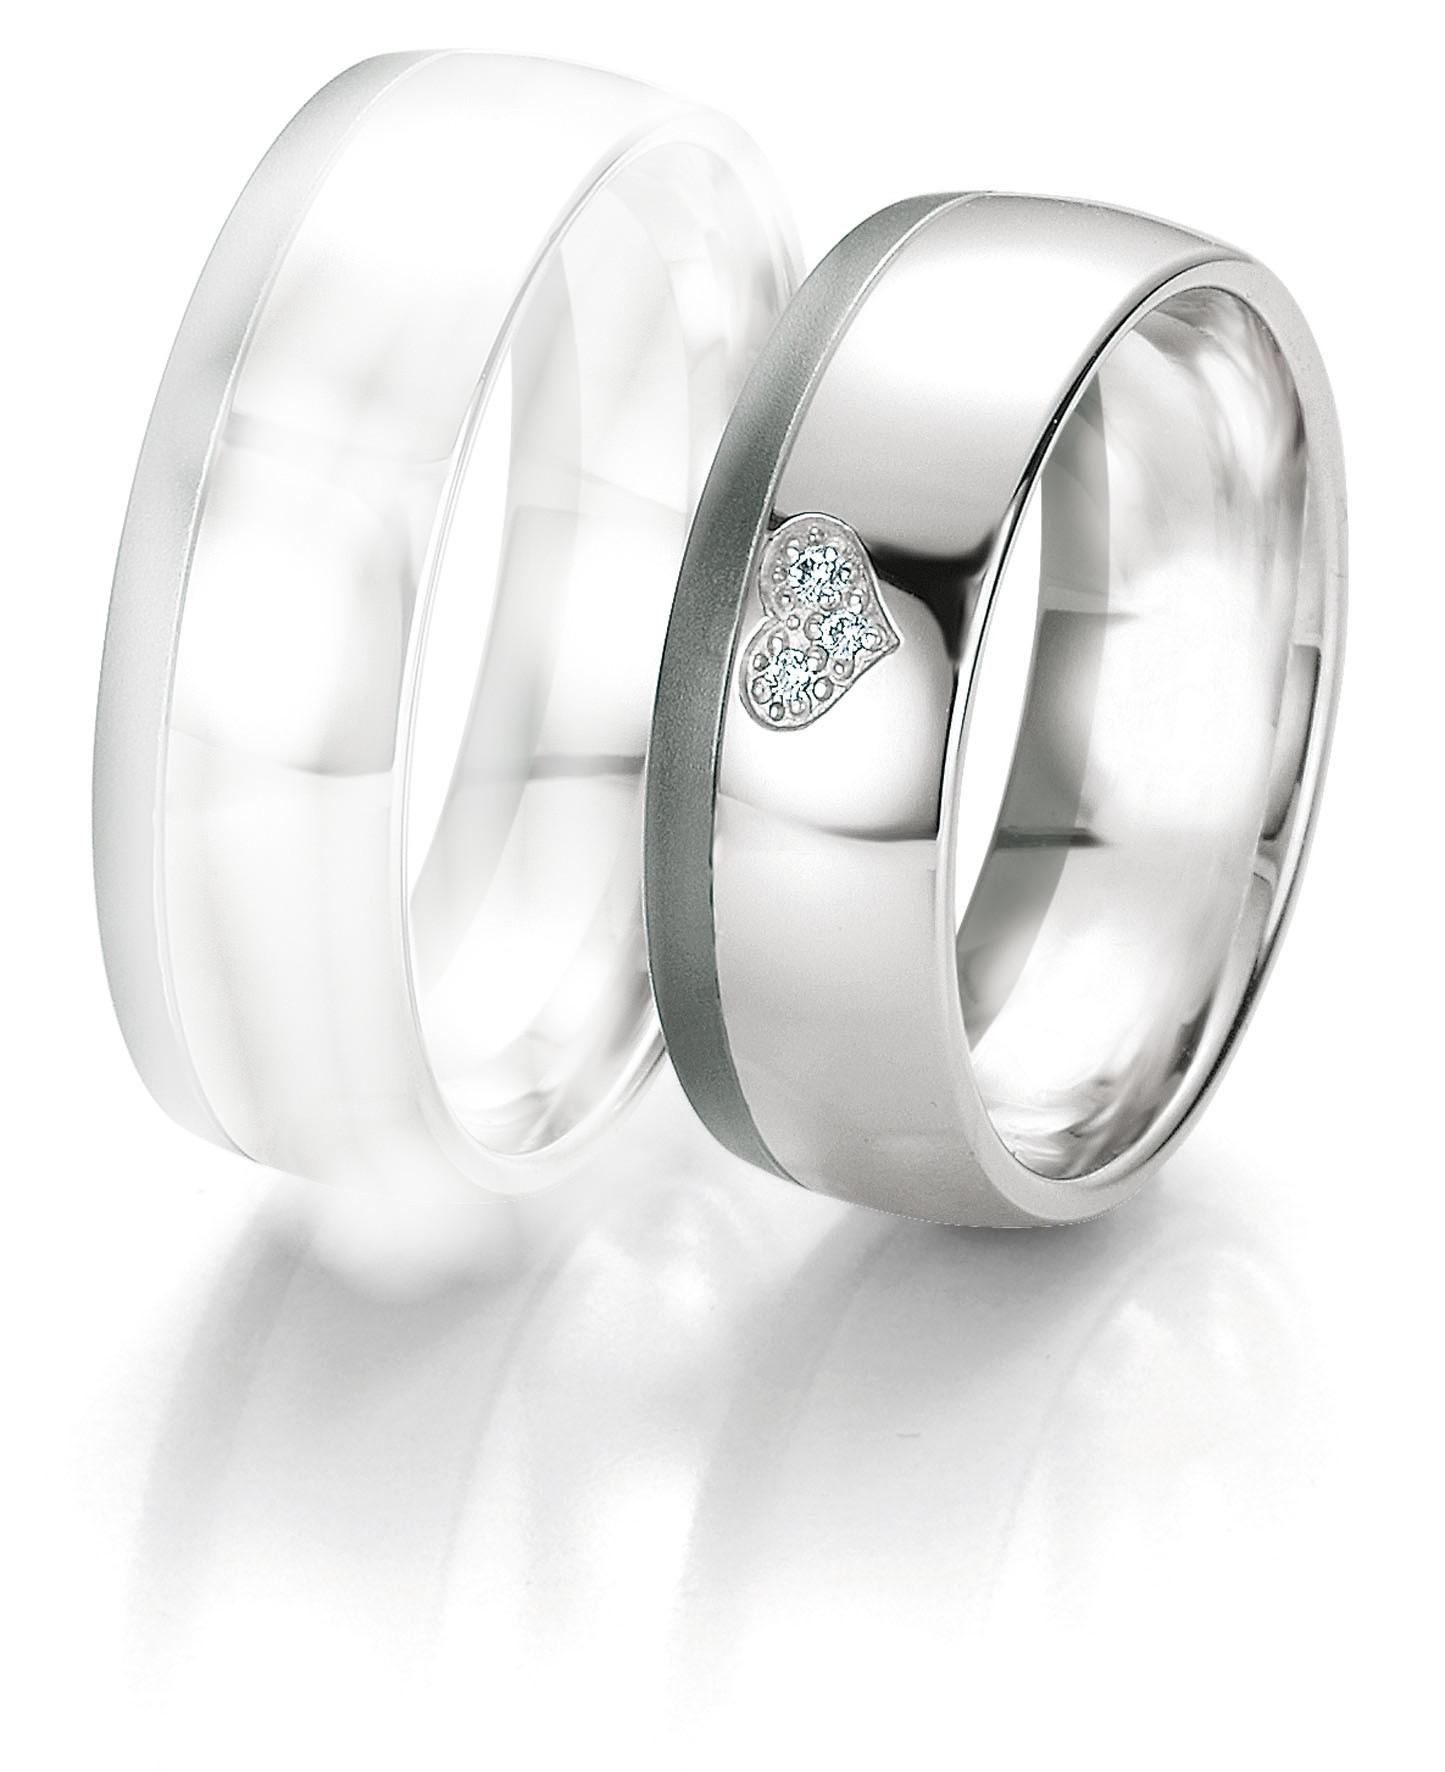 Alliance dame or blanc et diamants